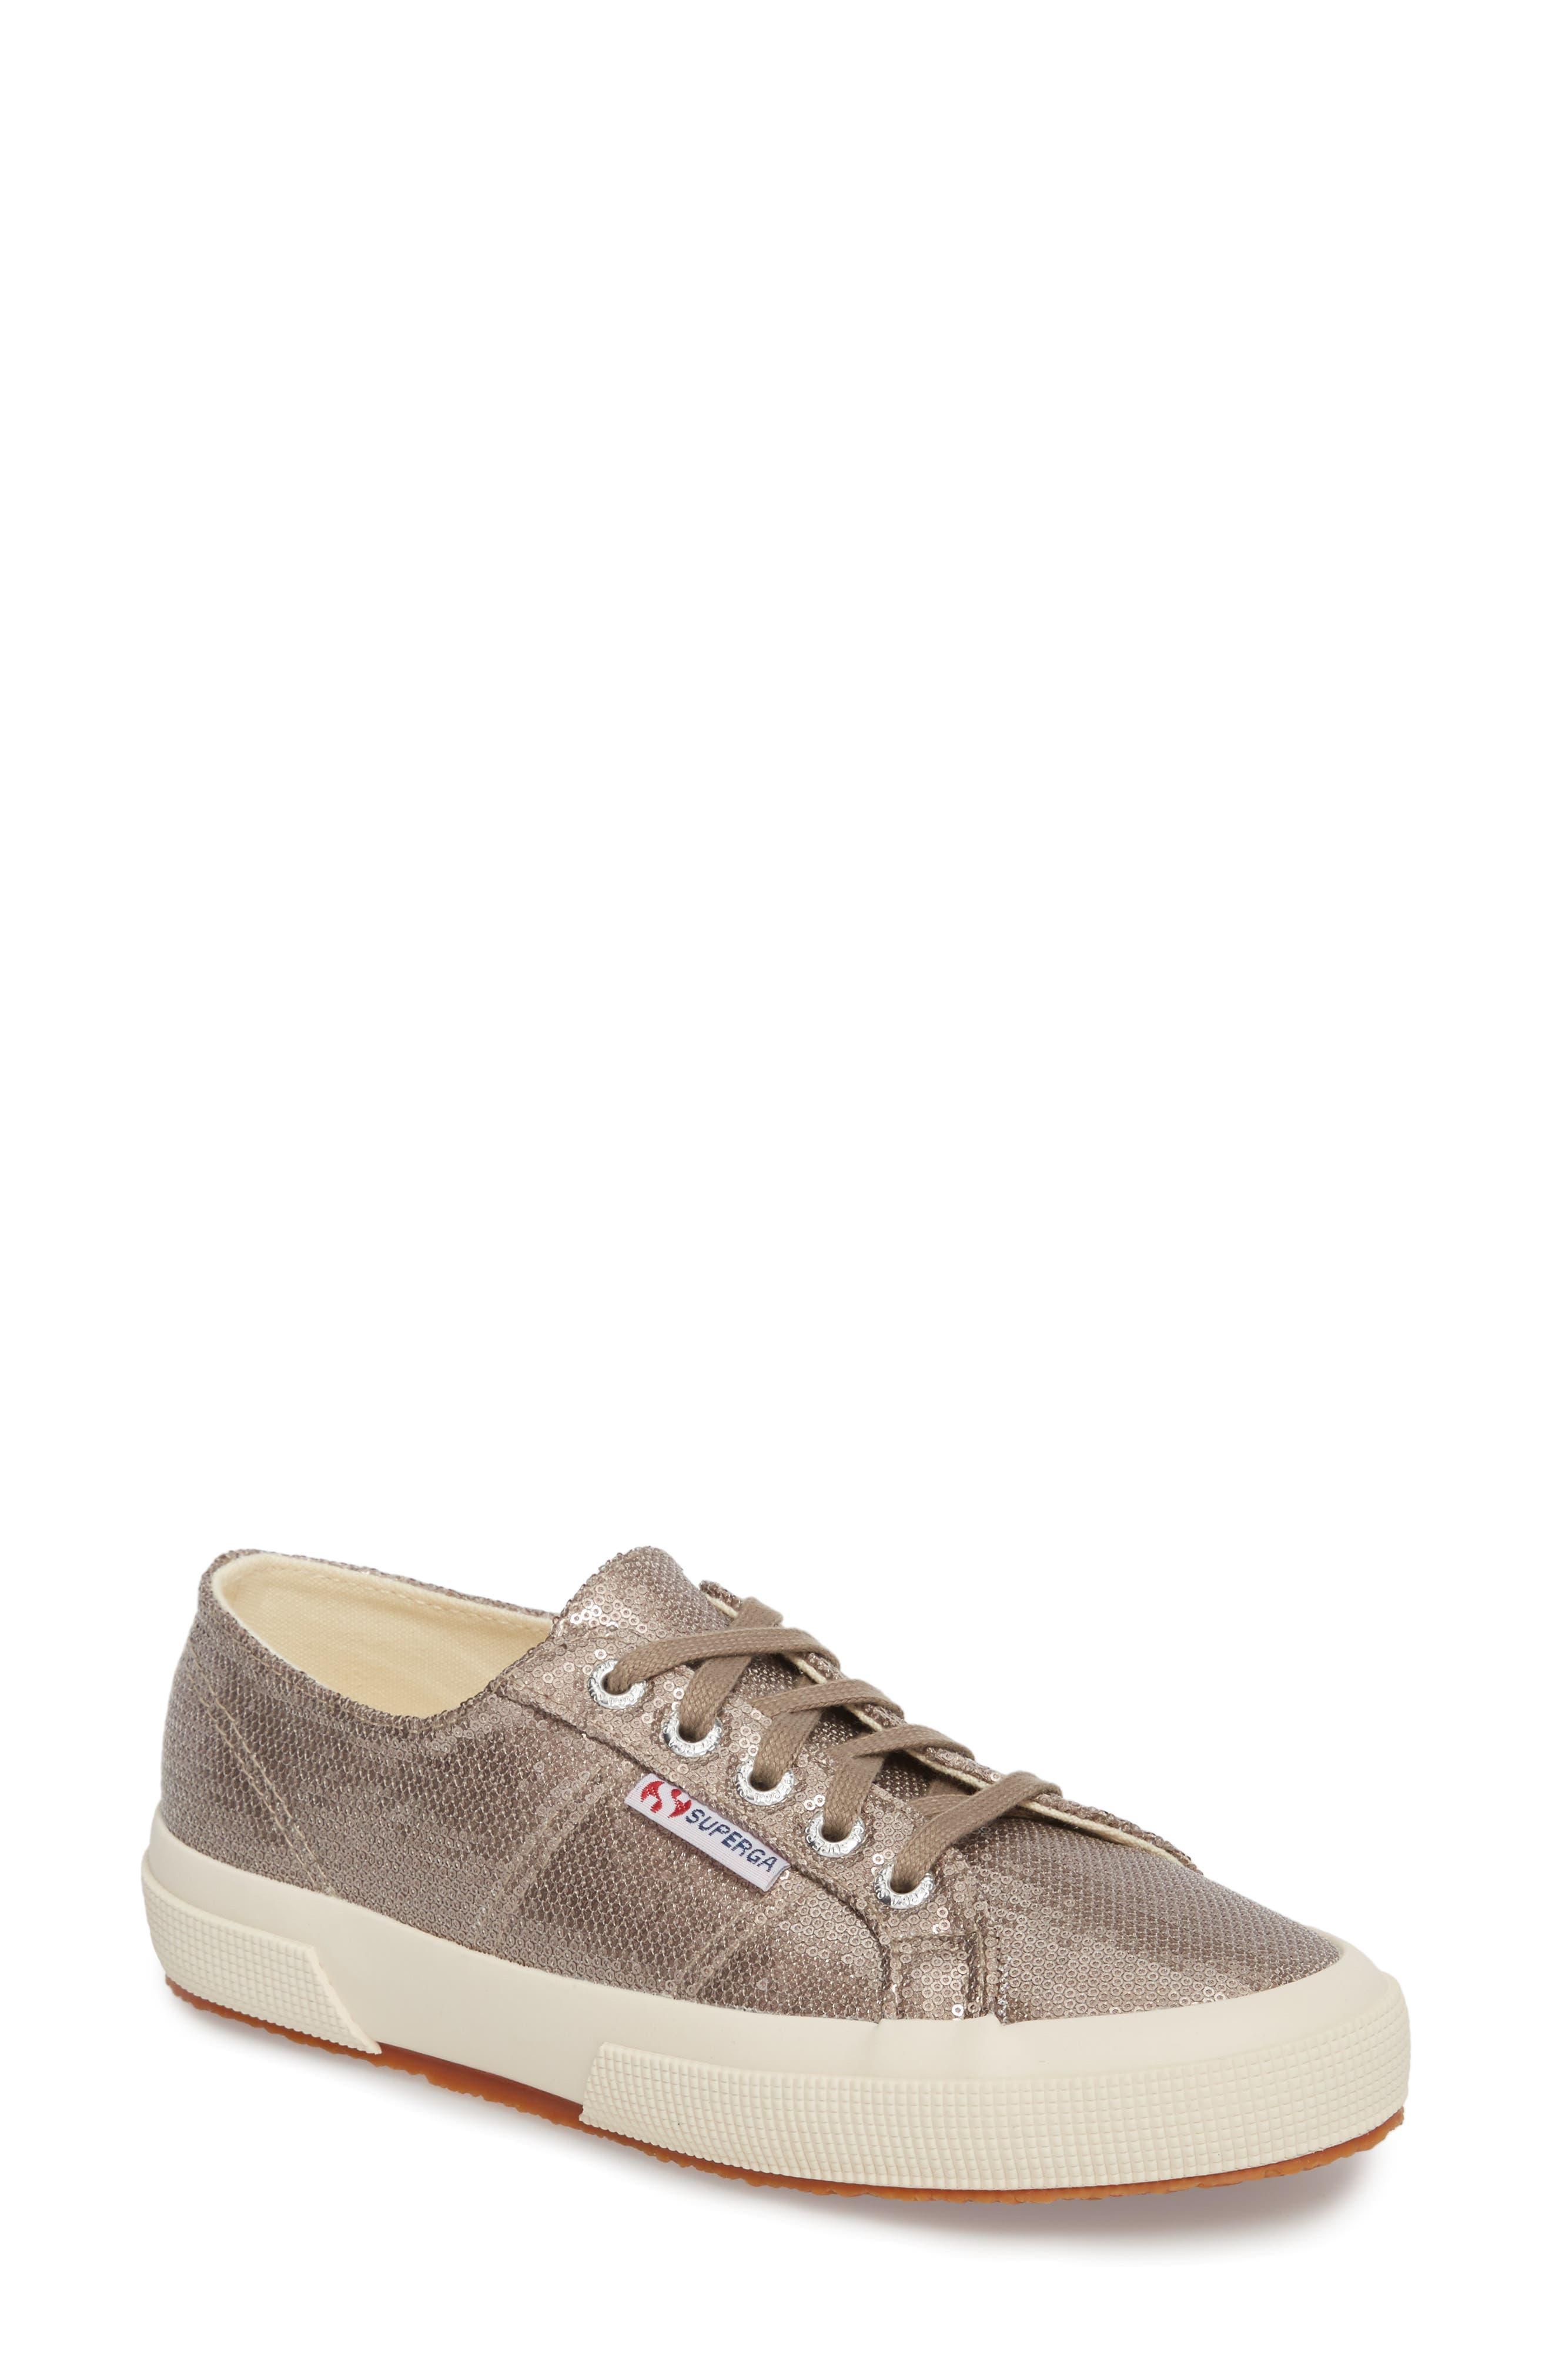 2750 Micro Sequin Sneaker,                         Main,                         color, Bronze